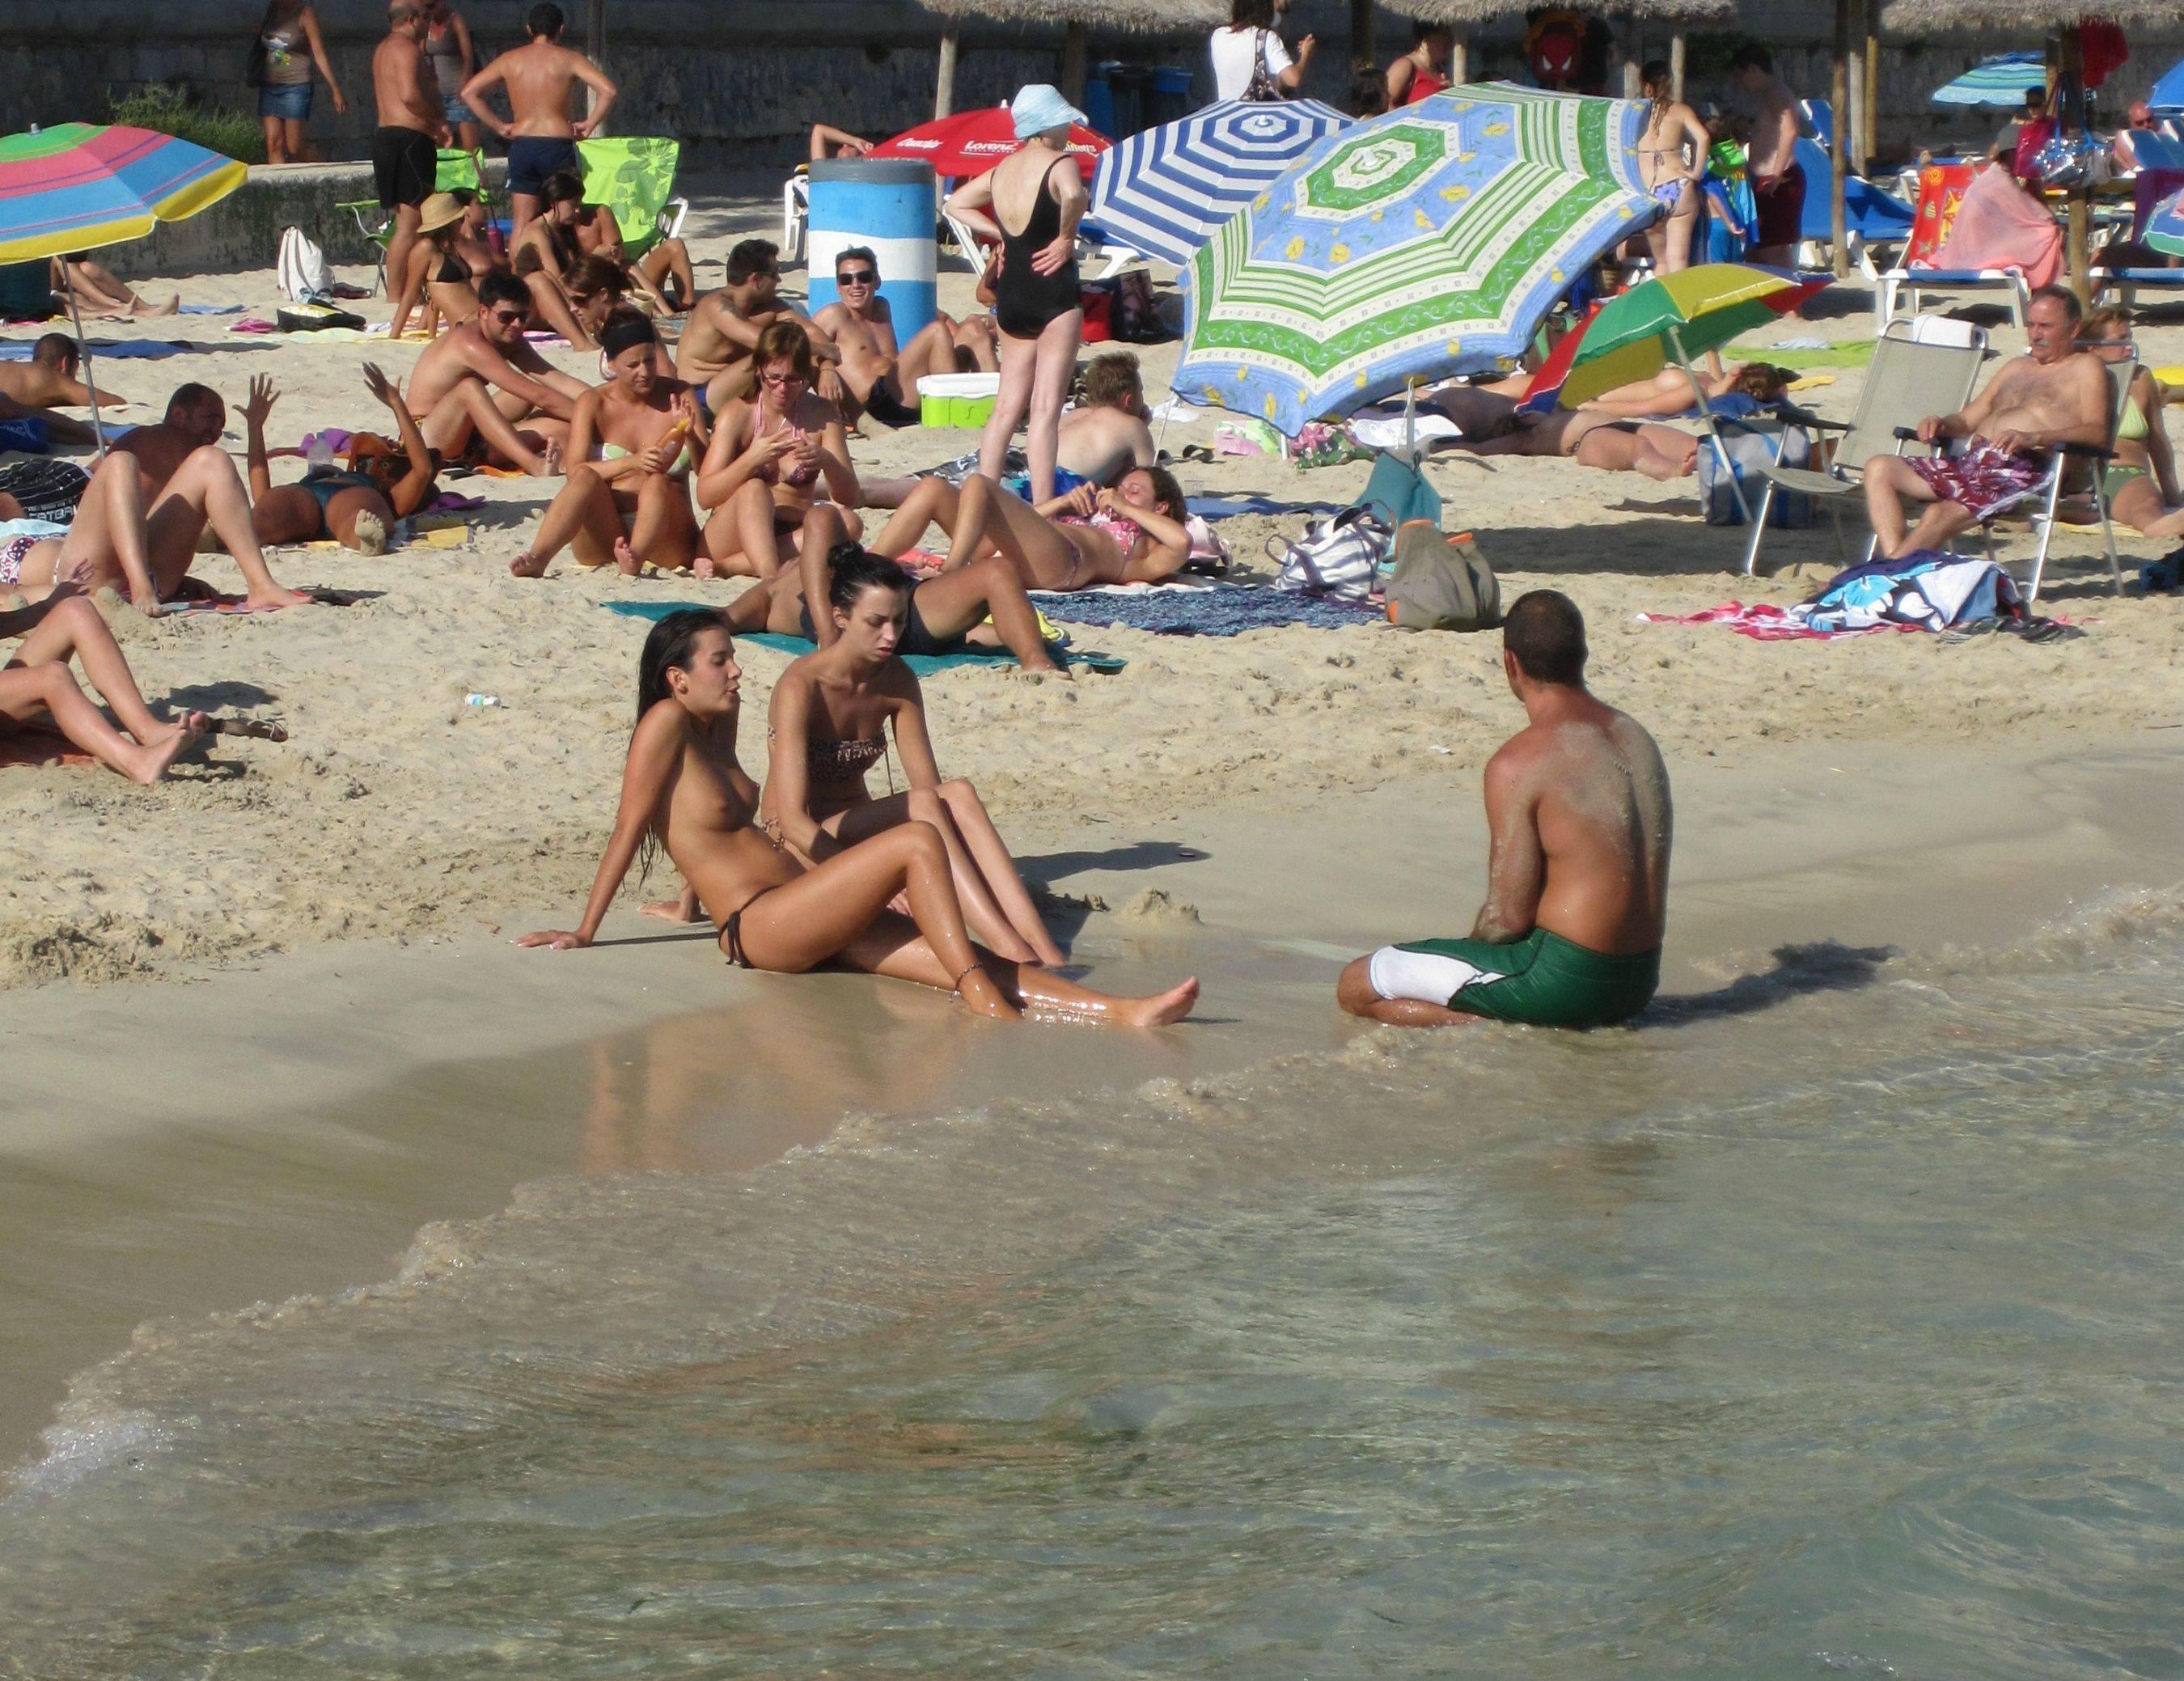 Topless teens feeling the surf on their feet